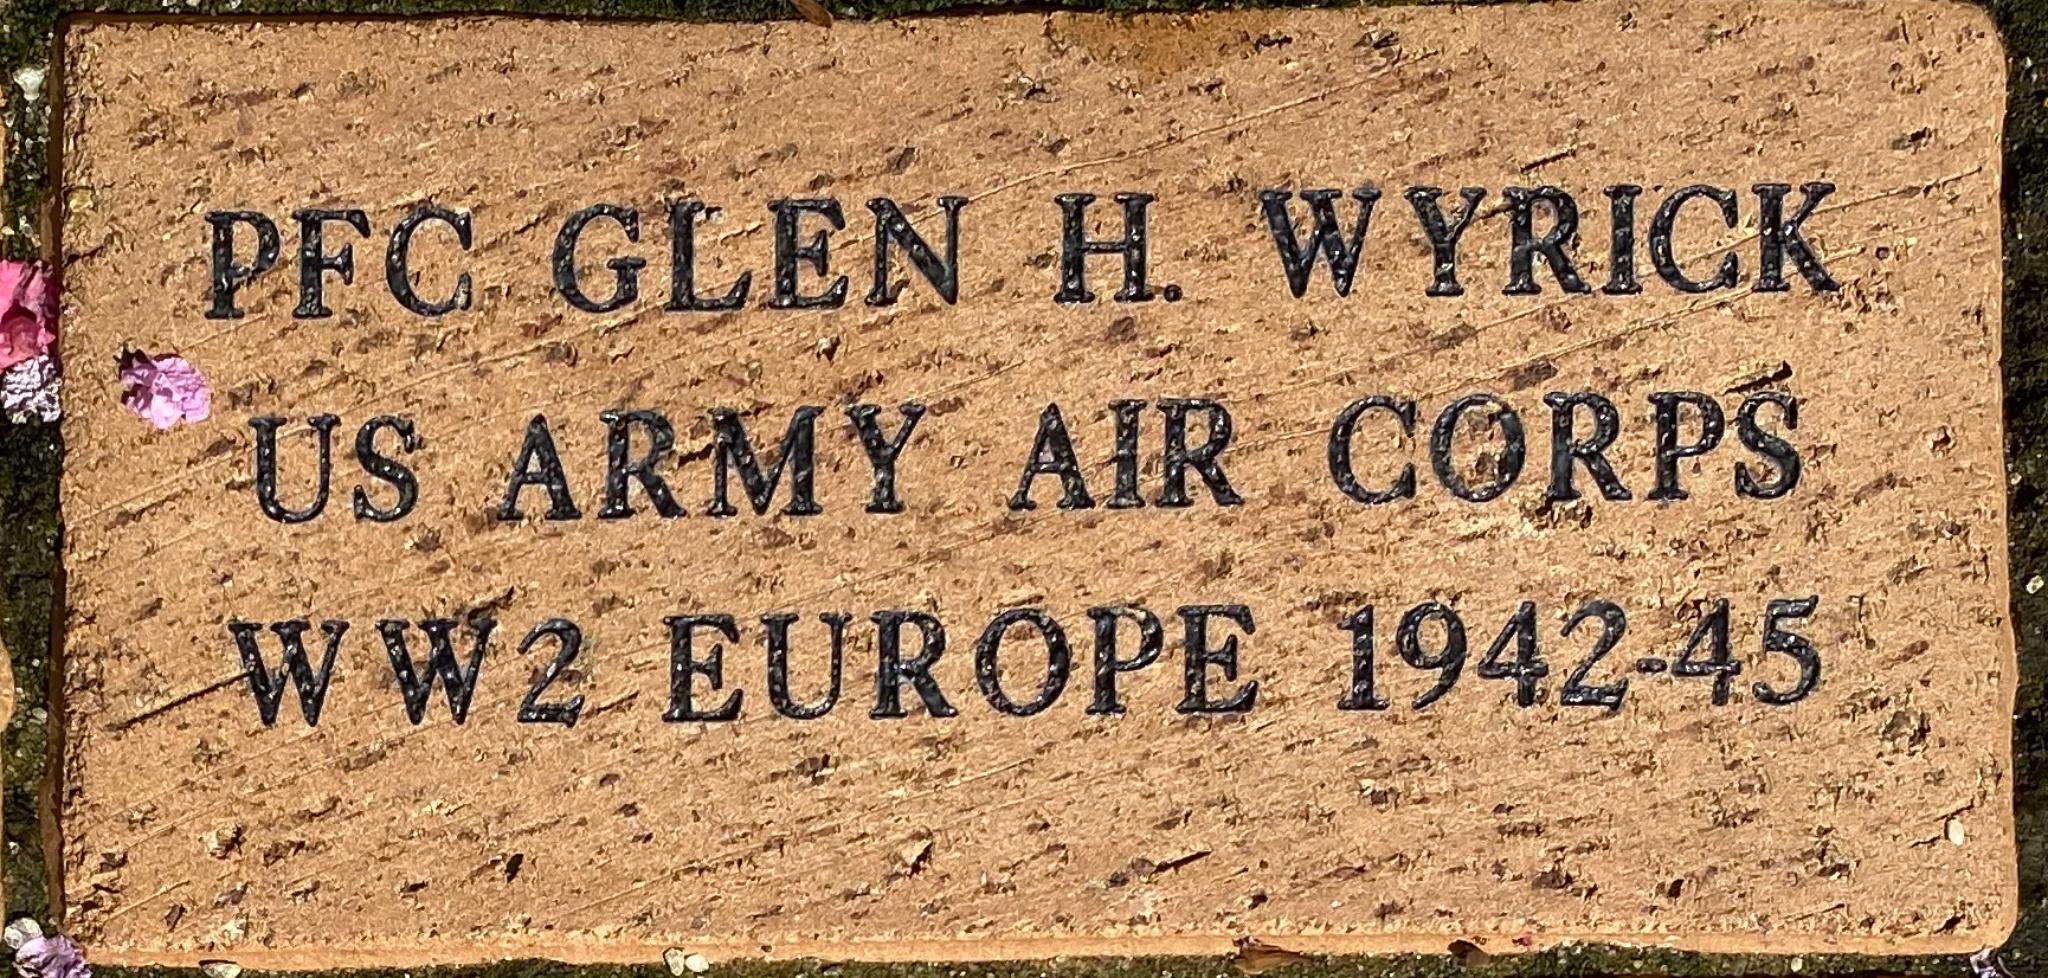 PFC GLEN H. WYRICK US ARMY AIR CORPS WW2 EUROPE 1942-45